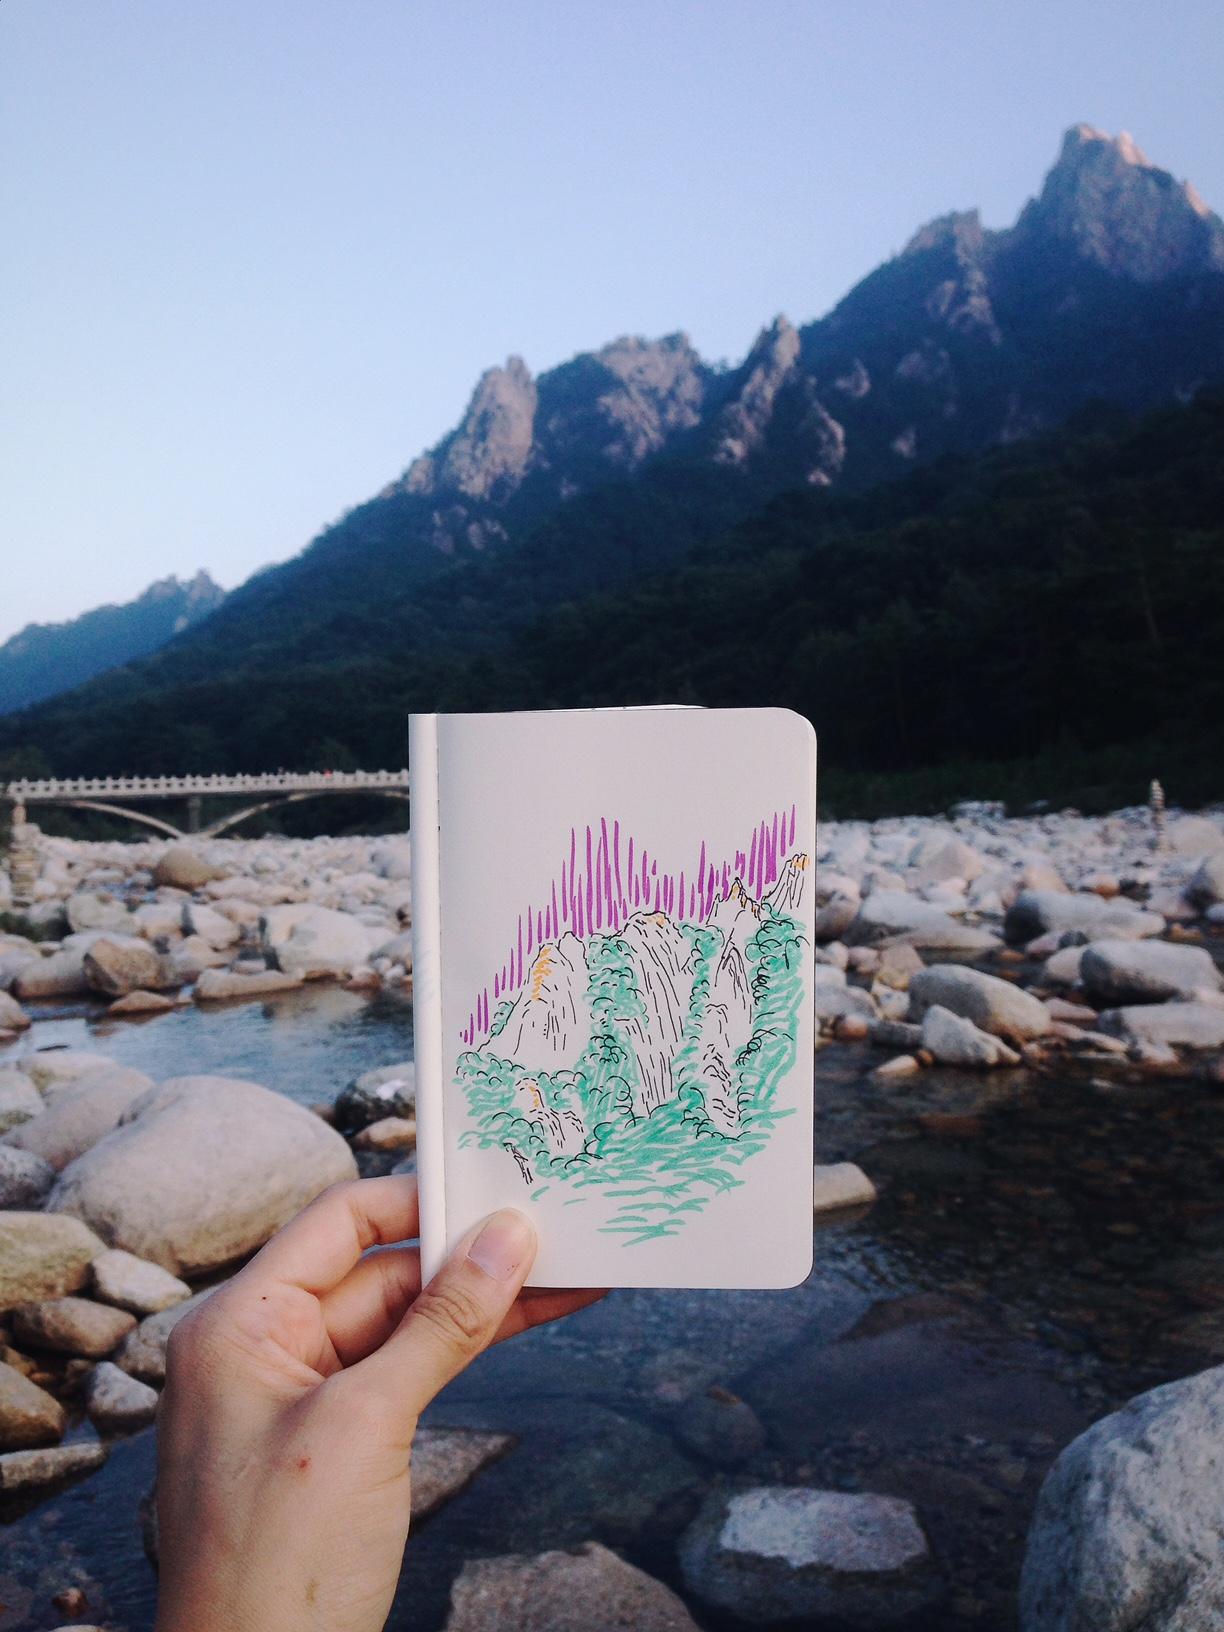 Seoraksan National Mountain in Korea